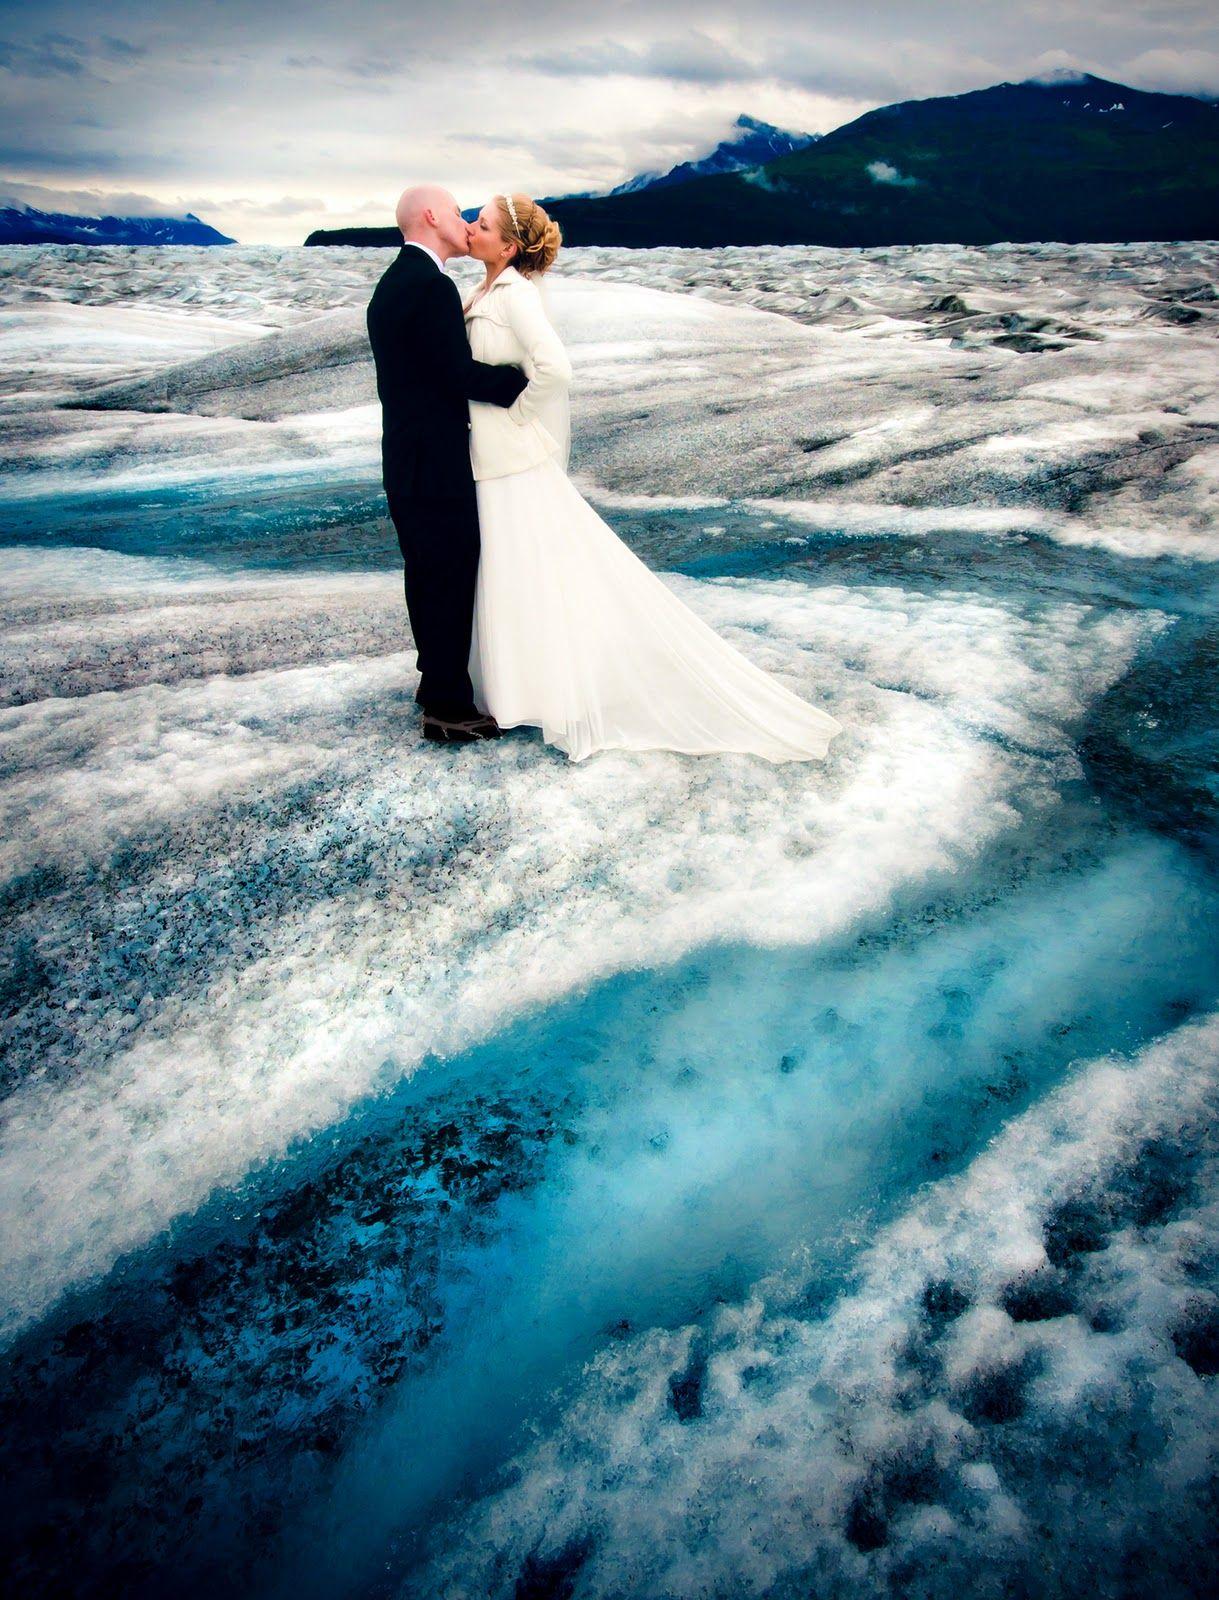 Fly In A Helicopter For An Alaskan Glacier Wedding Alaska